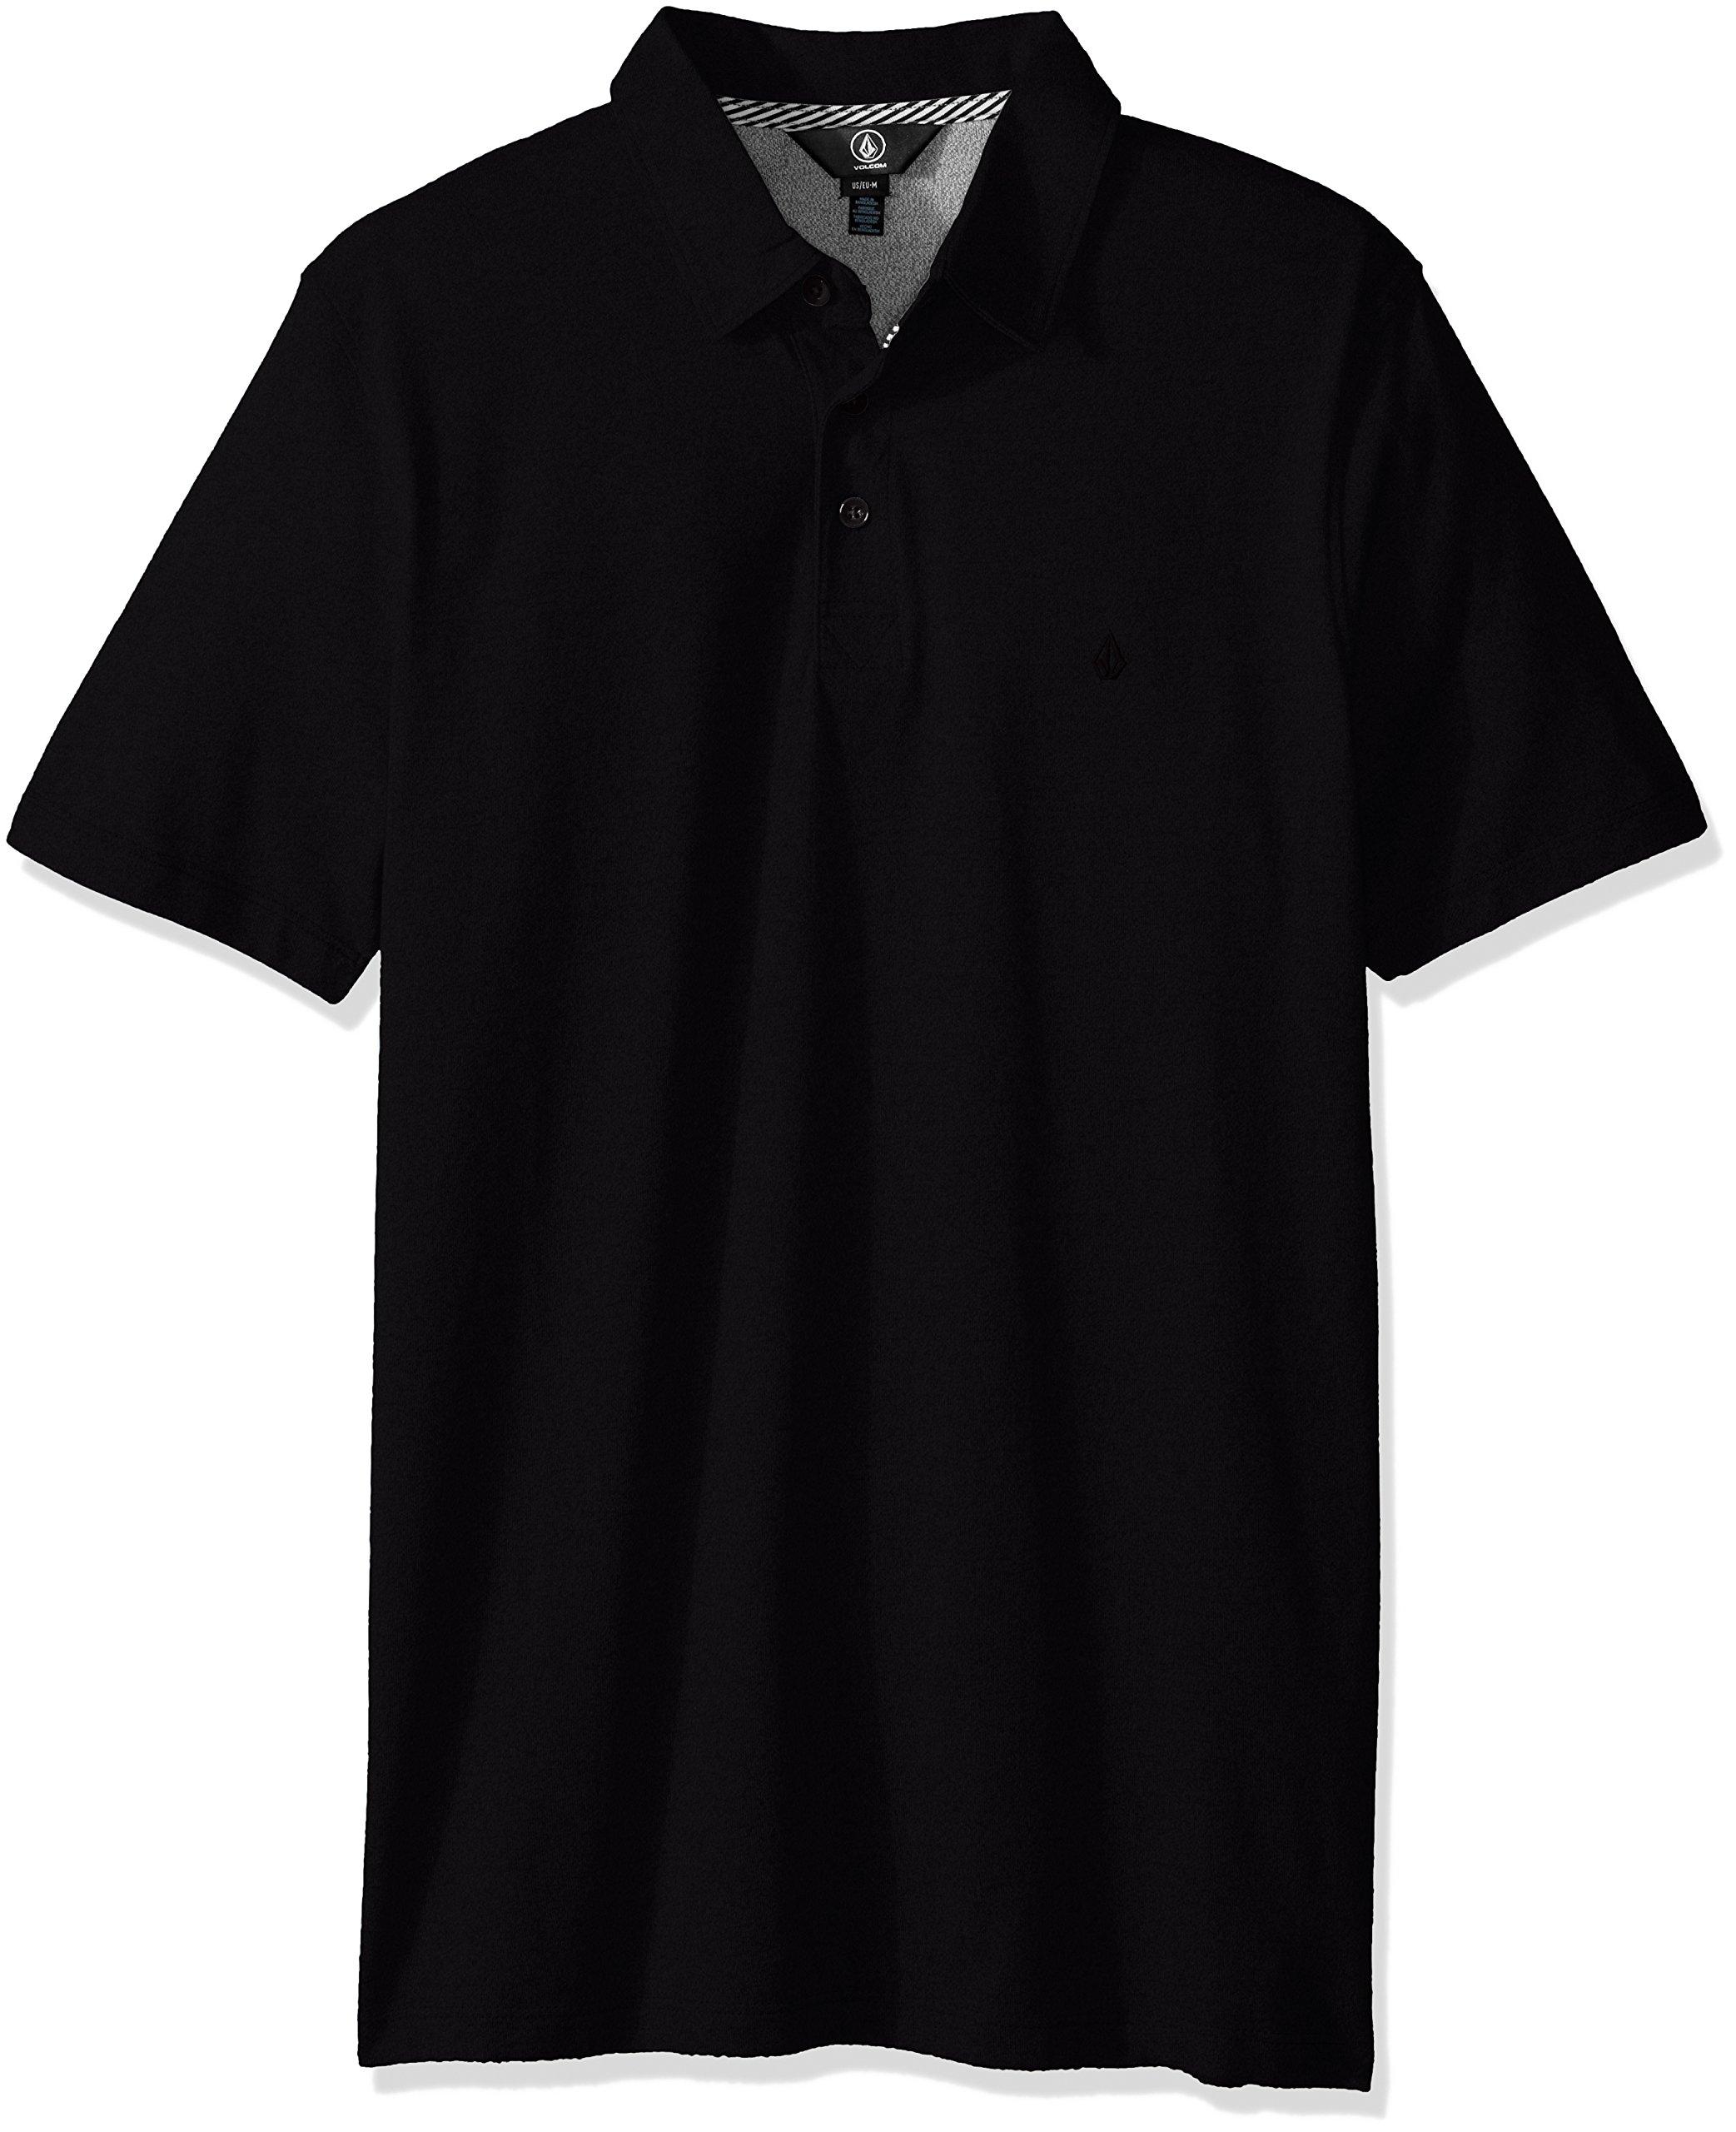 Volcom Men's Wowzer Modern Fit Polo, Black 2, Medium